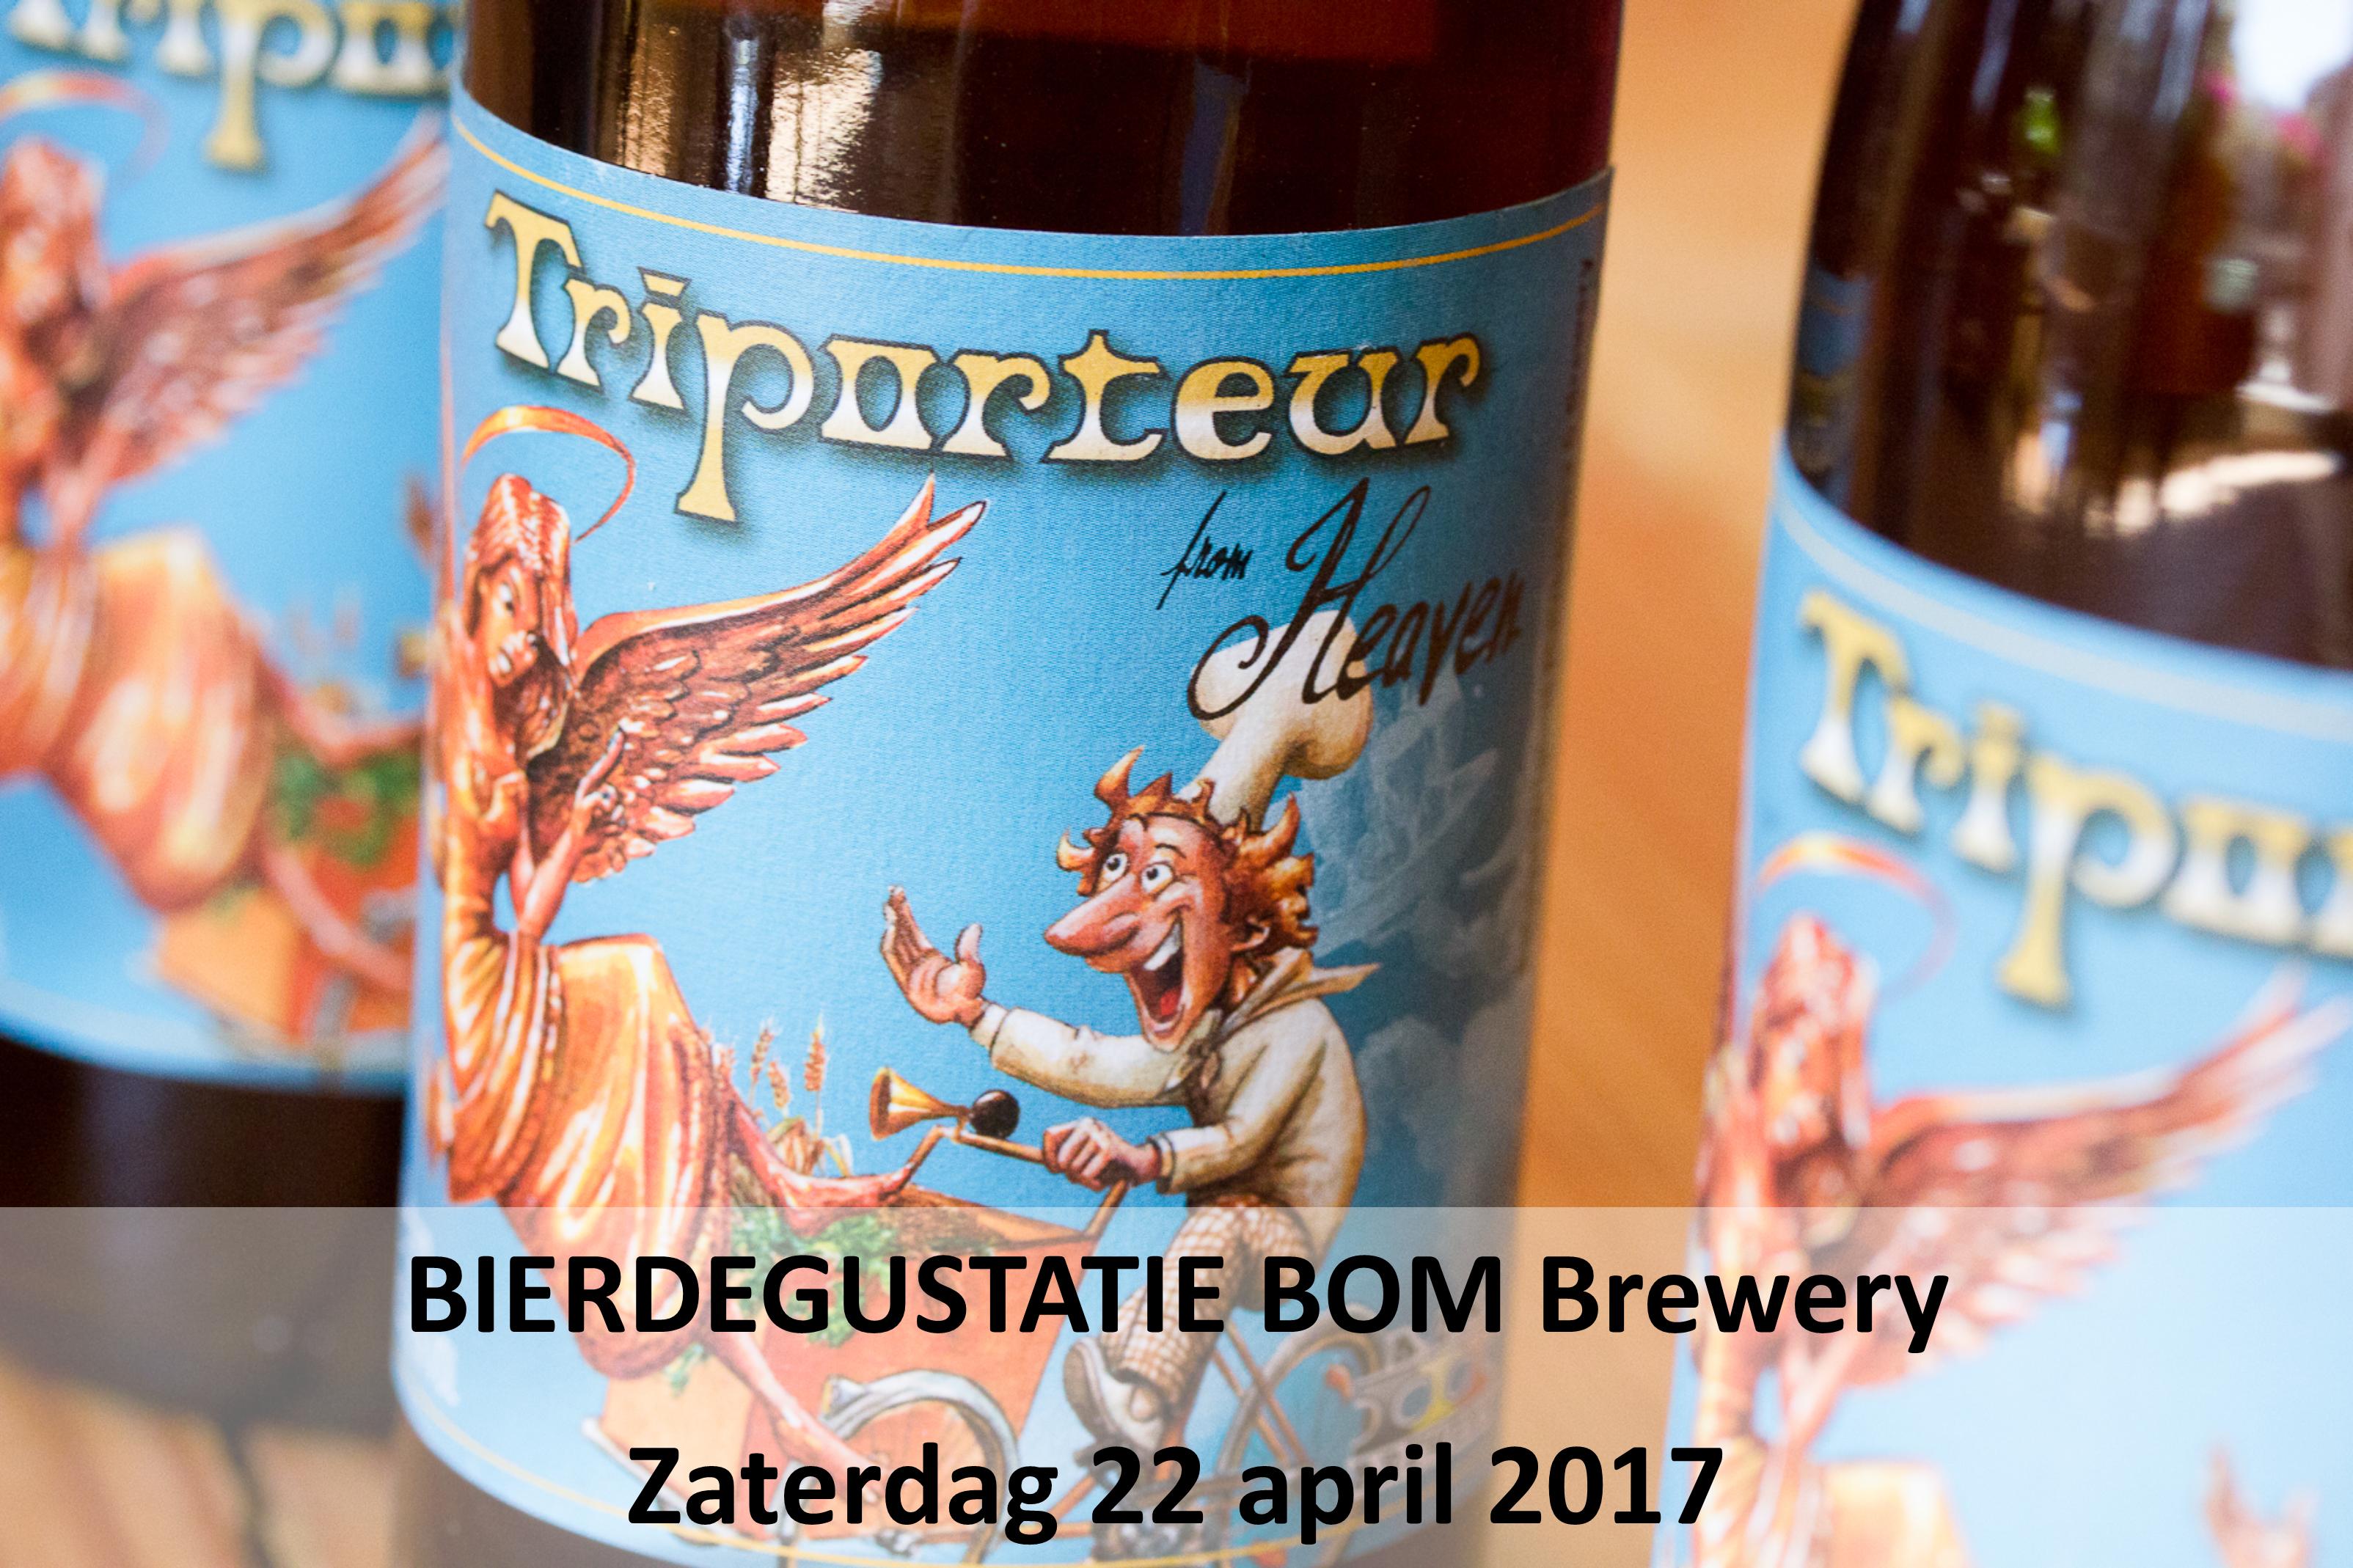 Degustatie BOM Brewery Bierparadijs